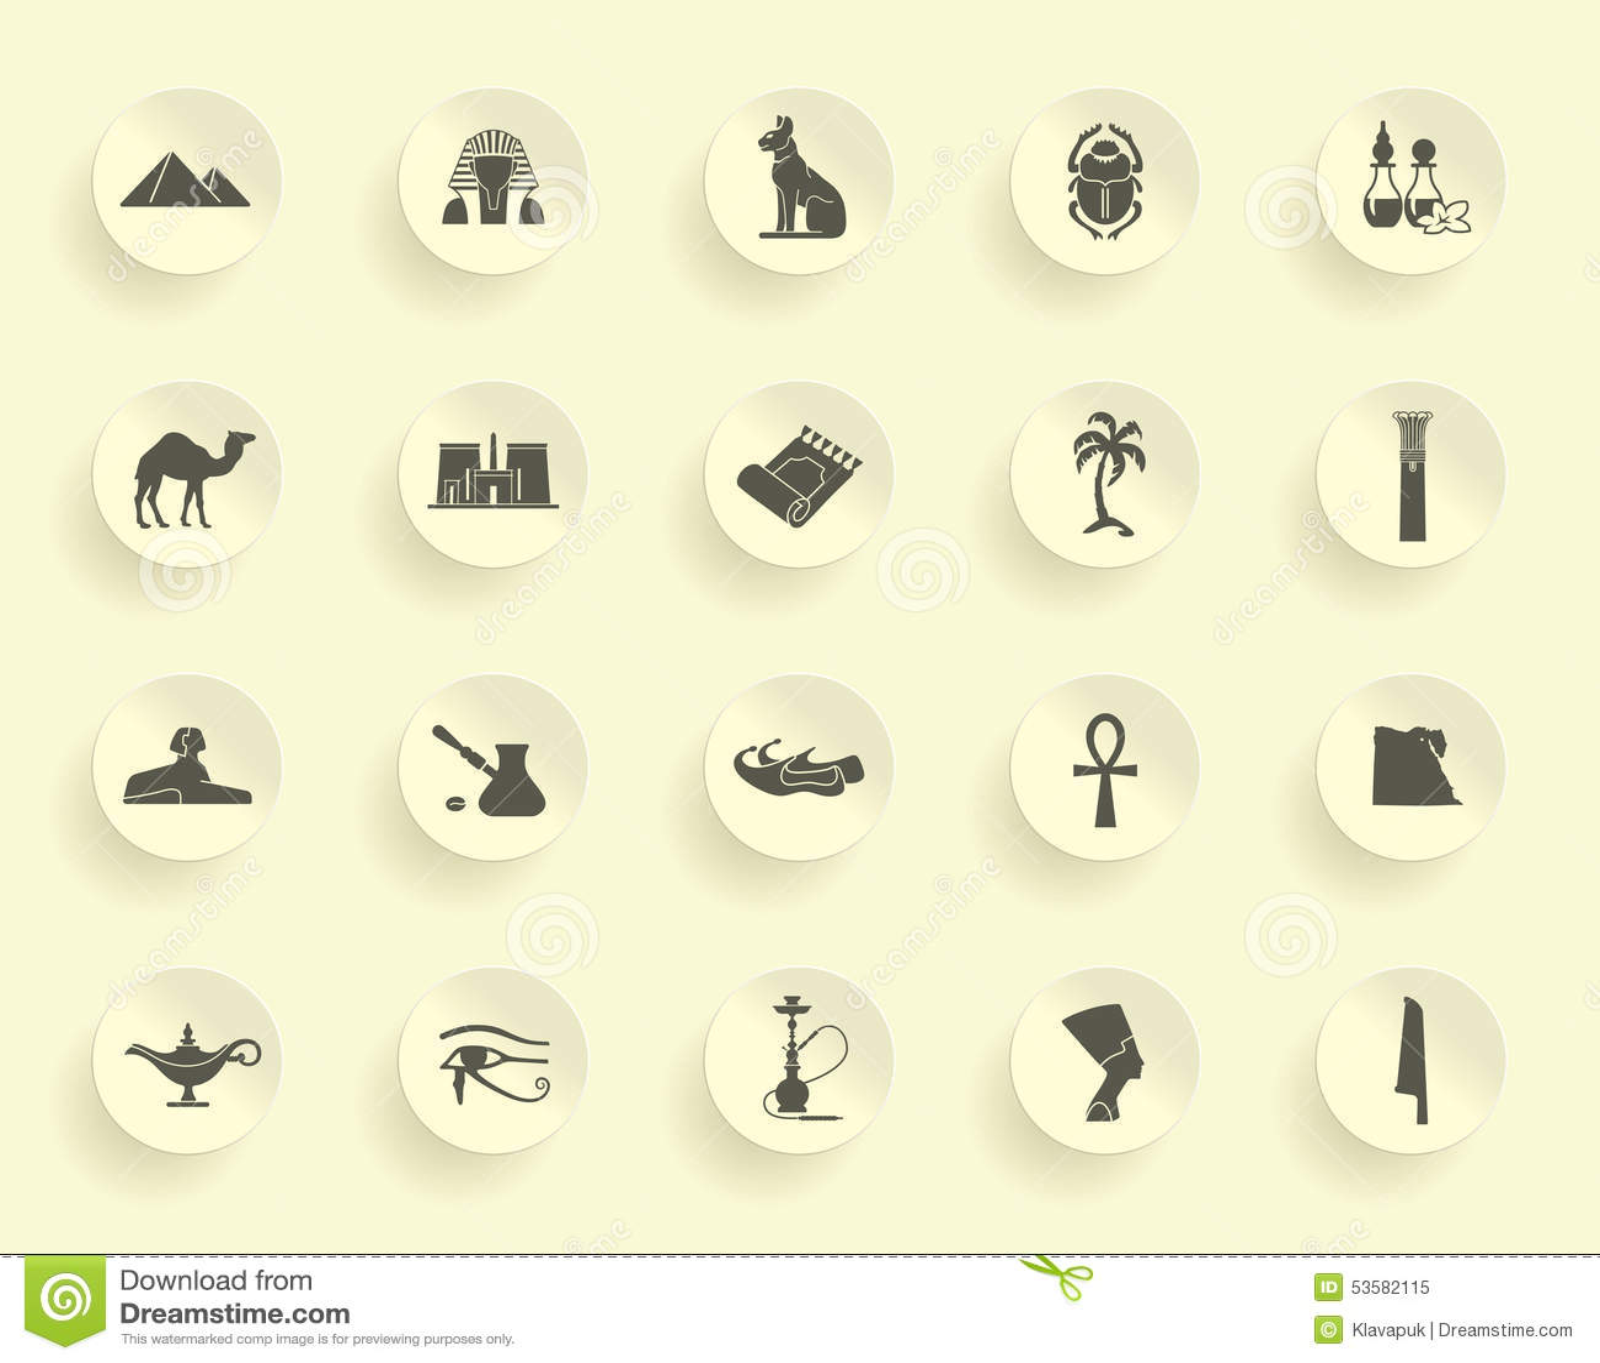 Egyptian Symbols Stock Vector Illustration Of Karnak 53582115